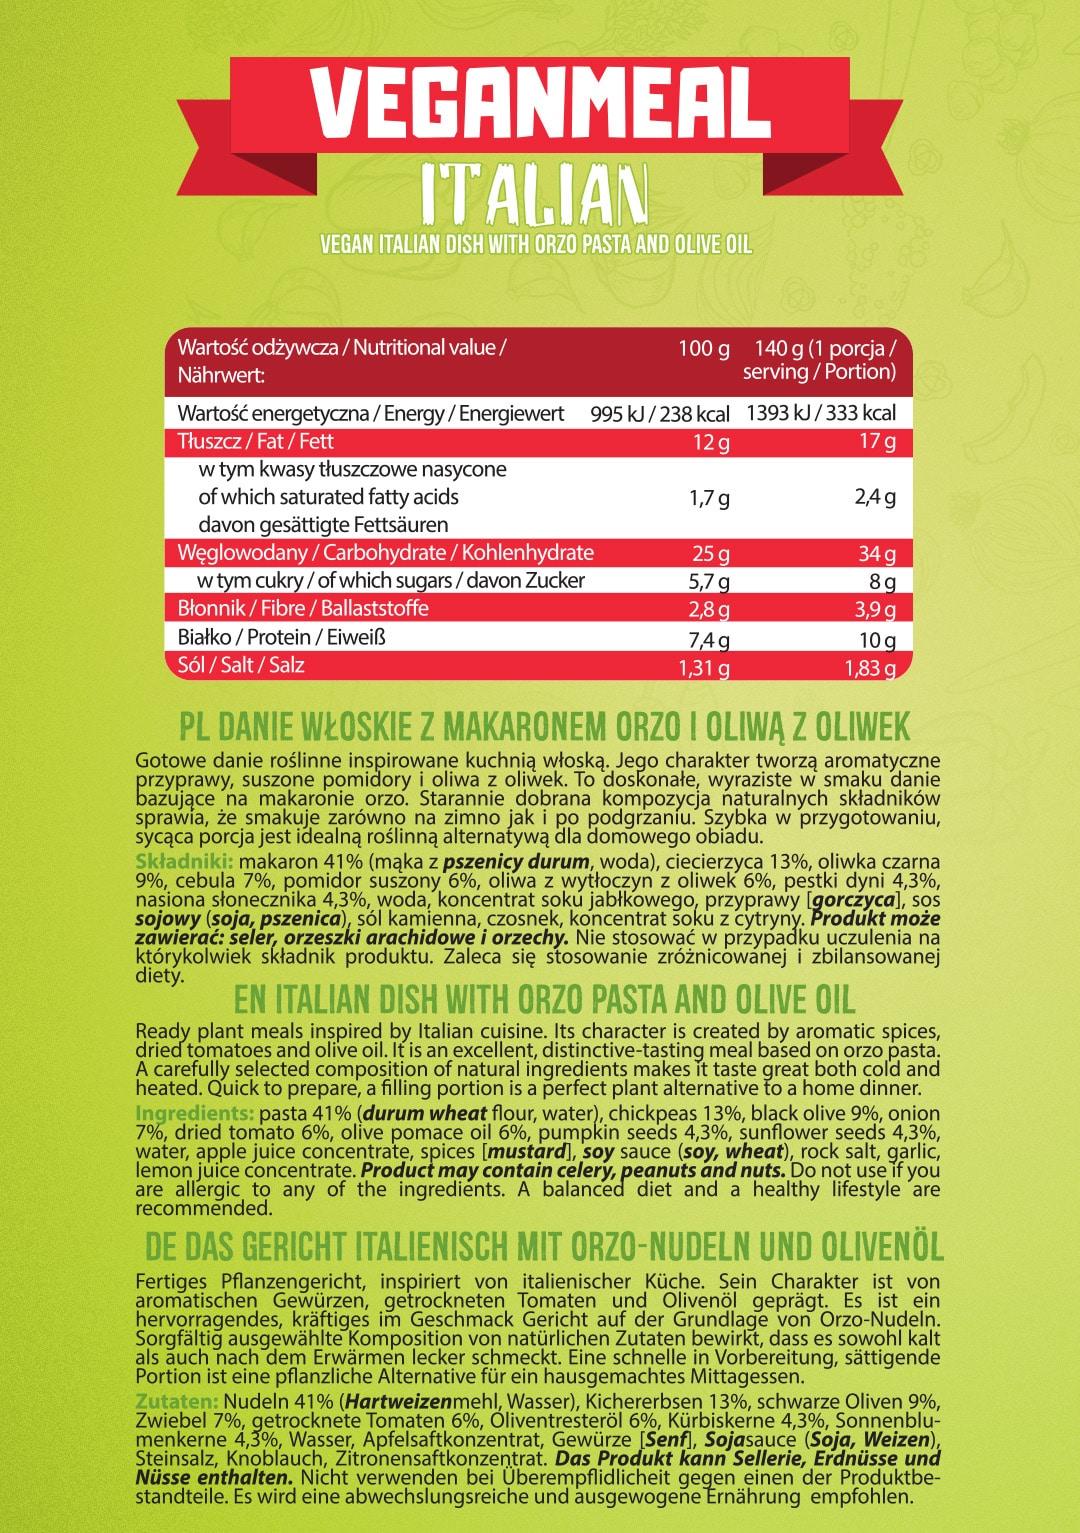 vegan-meal-italian-all-nutrition